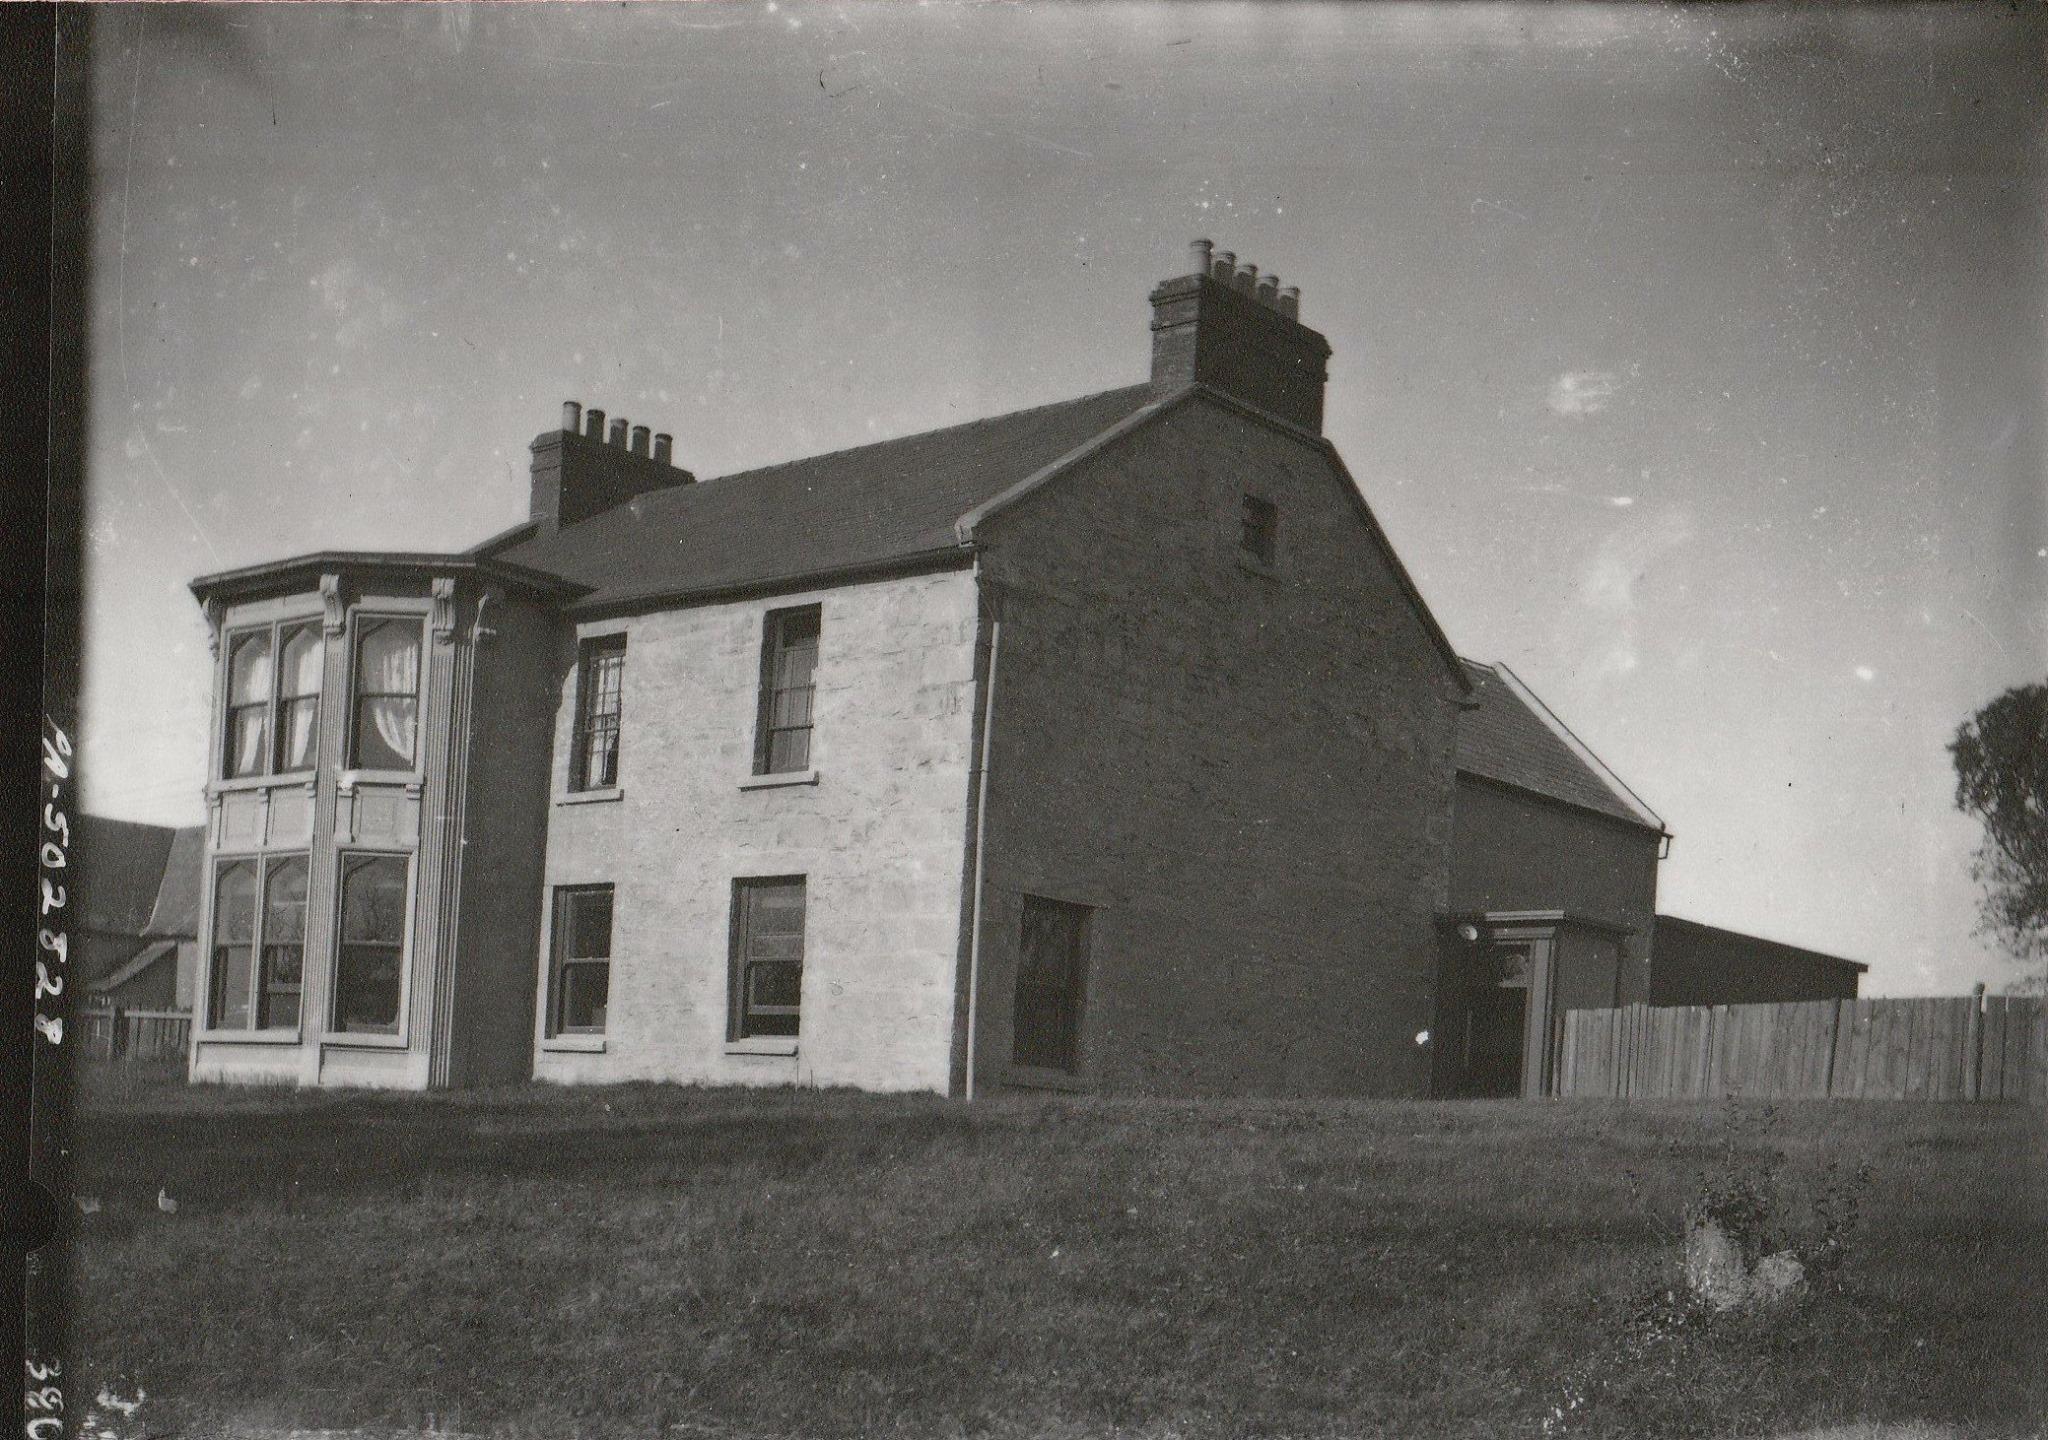 Ridley Hall, 1940